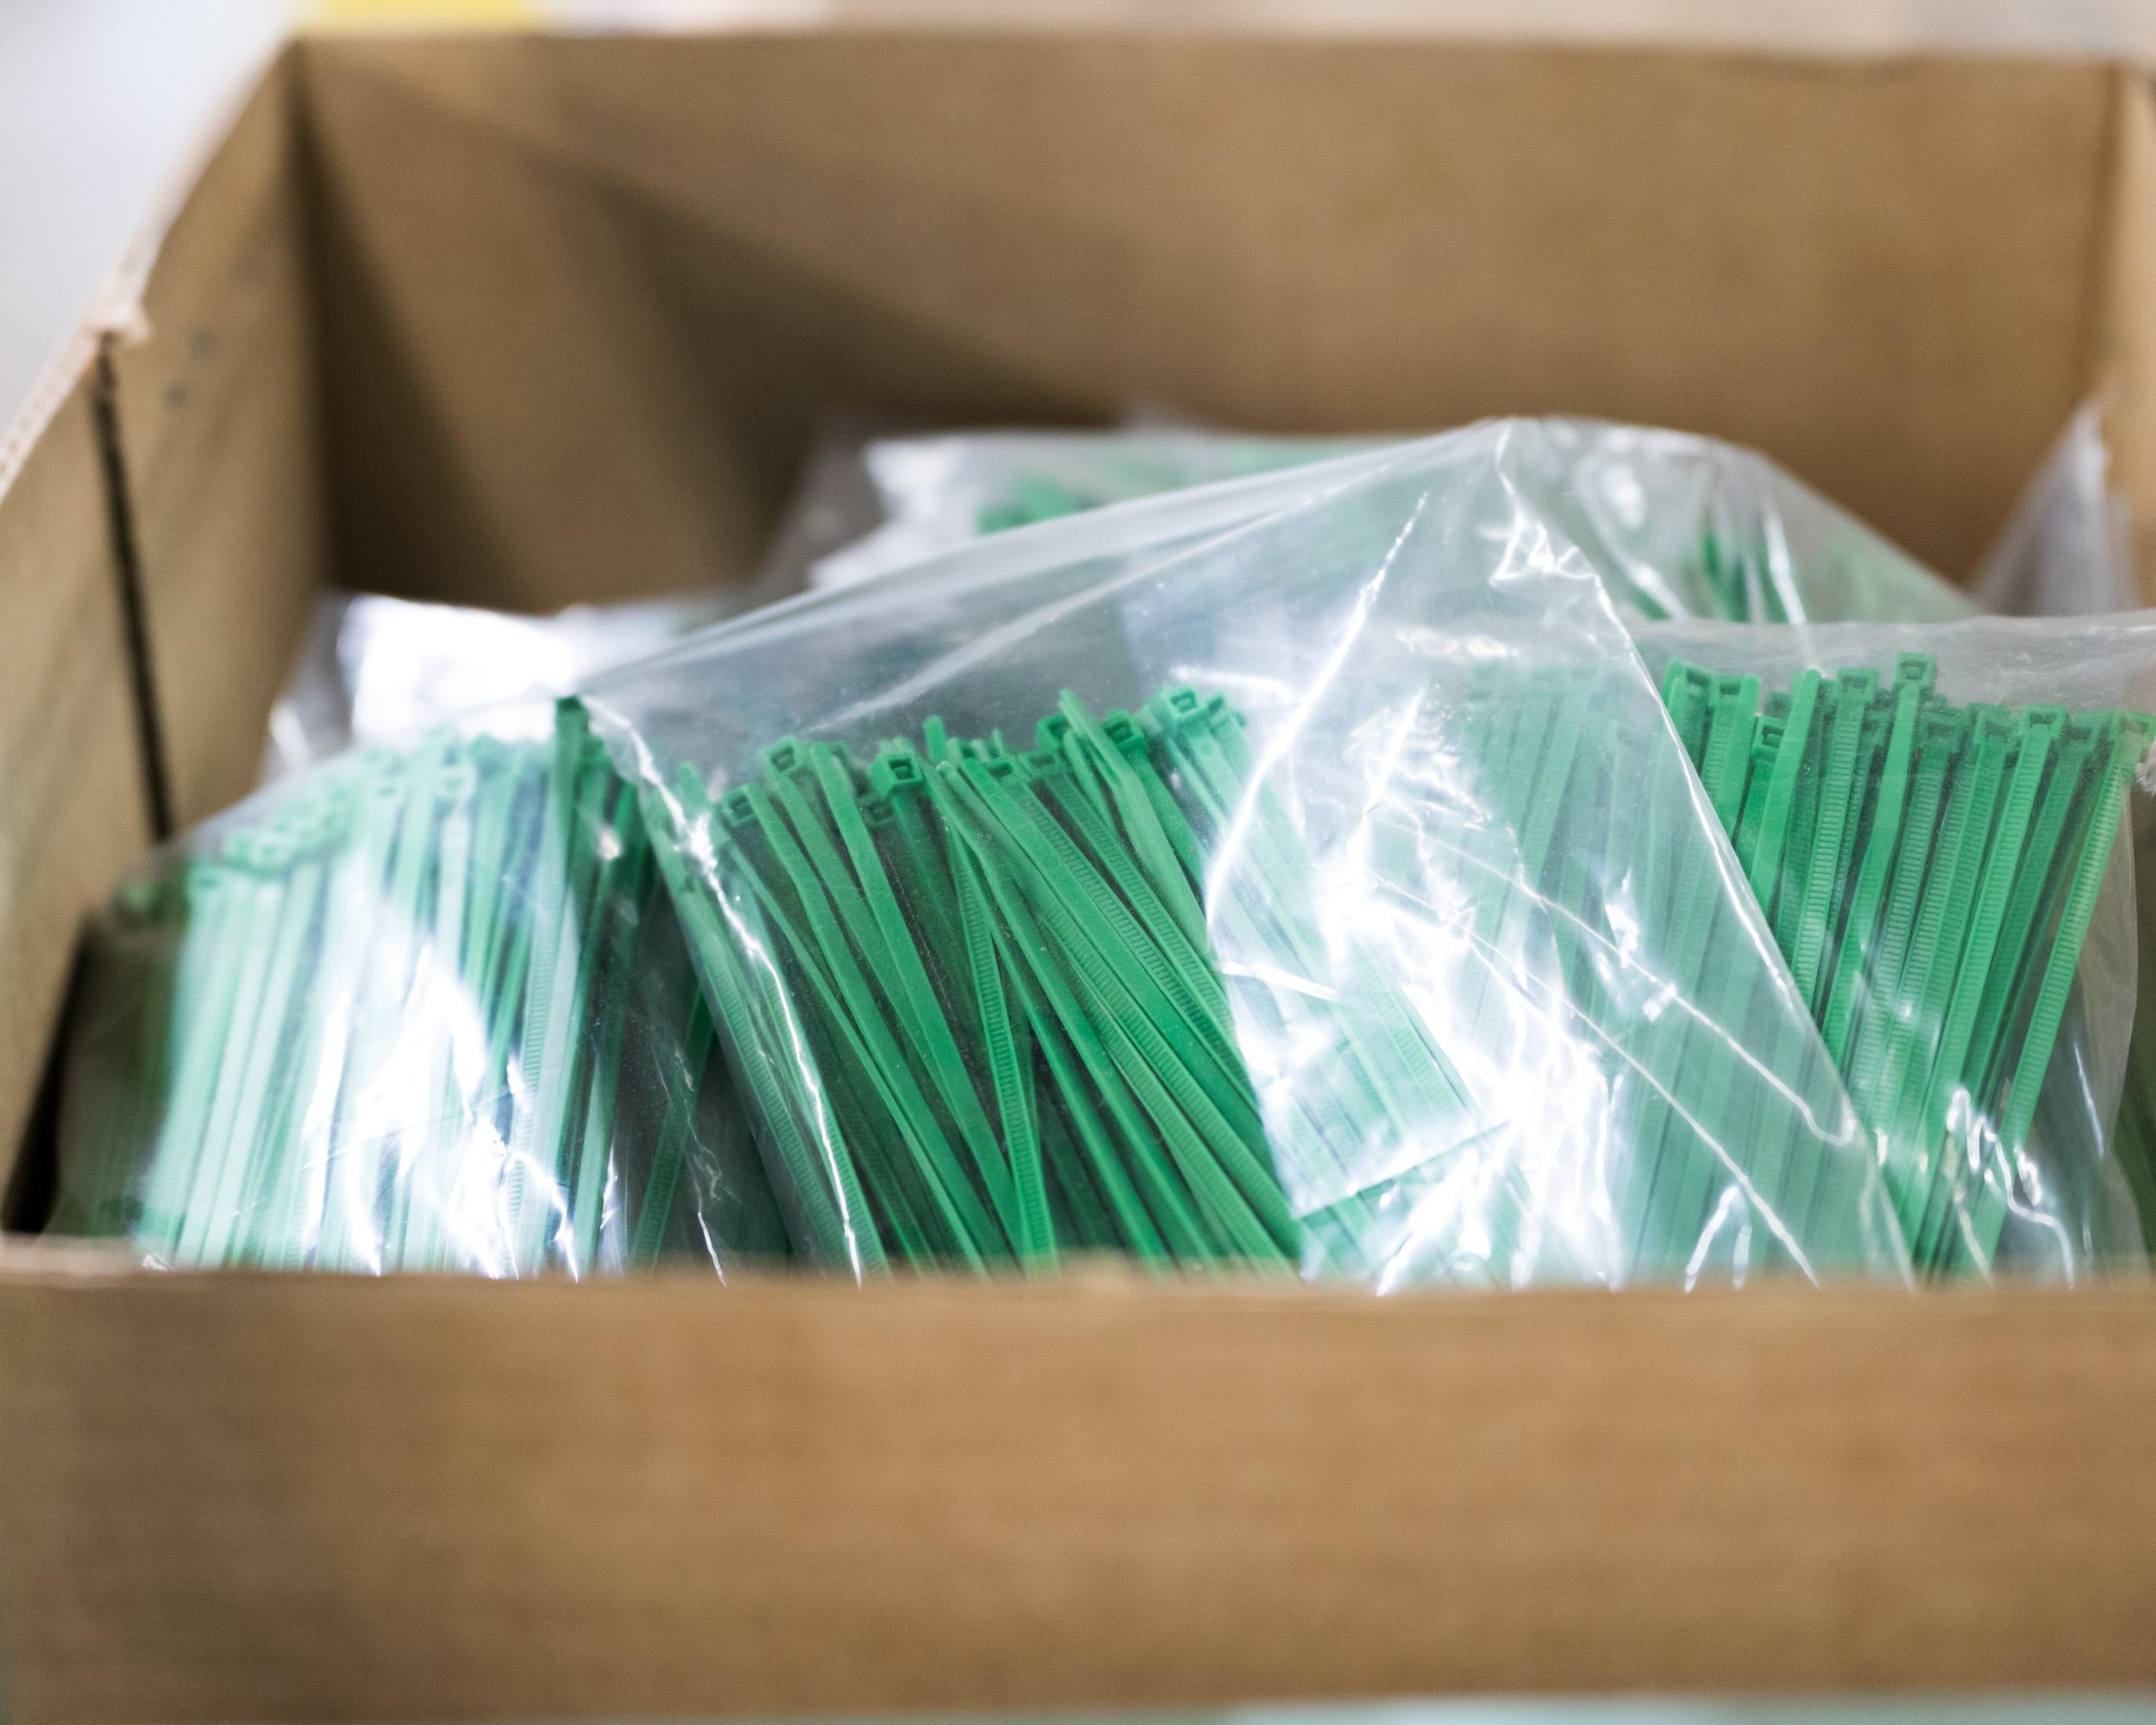 A box of green zip-ties